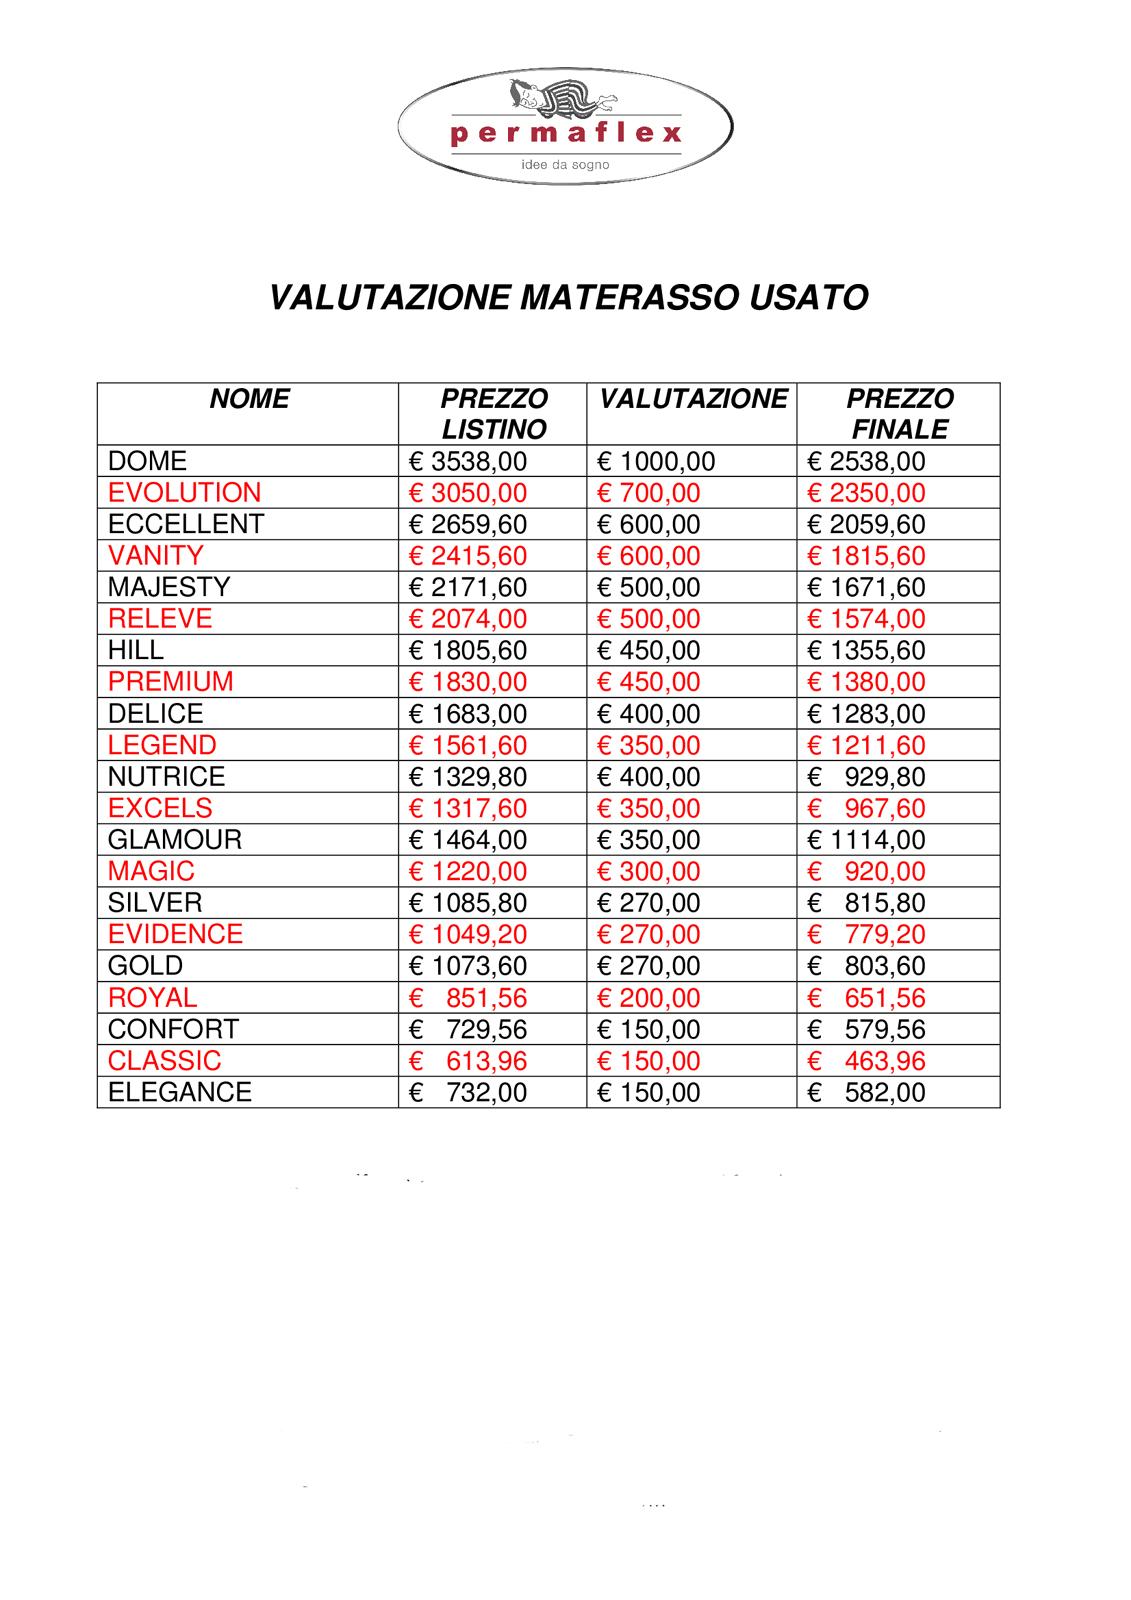 Materasso Permaflex Gold Prezzi.Permaflex Tabella Valutaz Righetti Mobili Novara